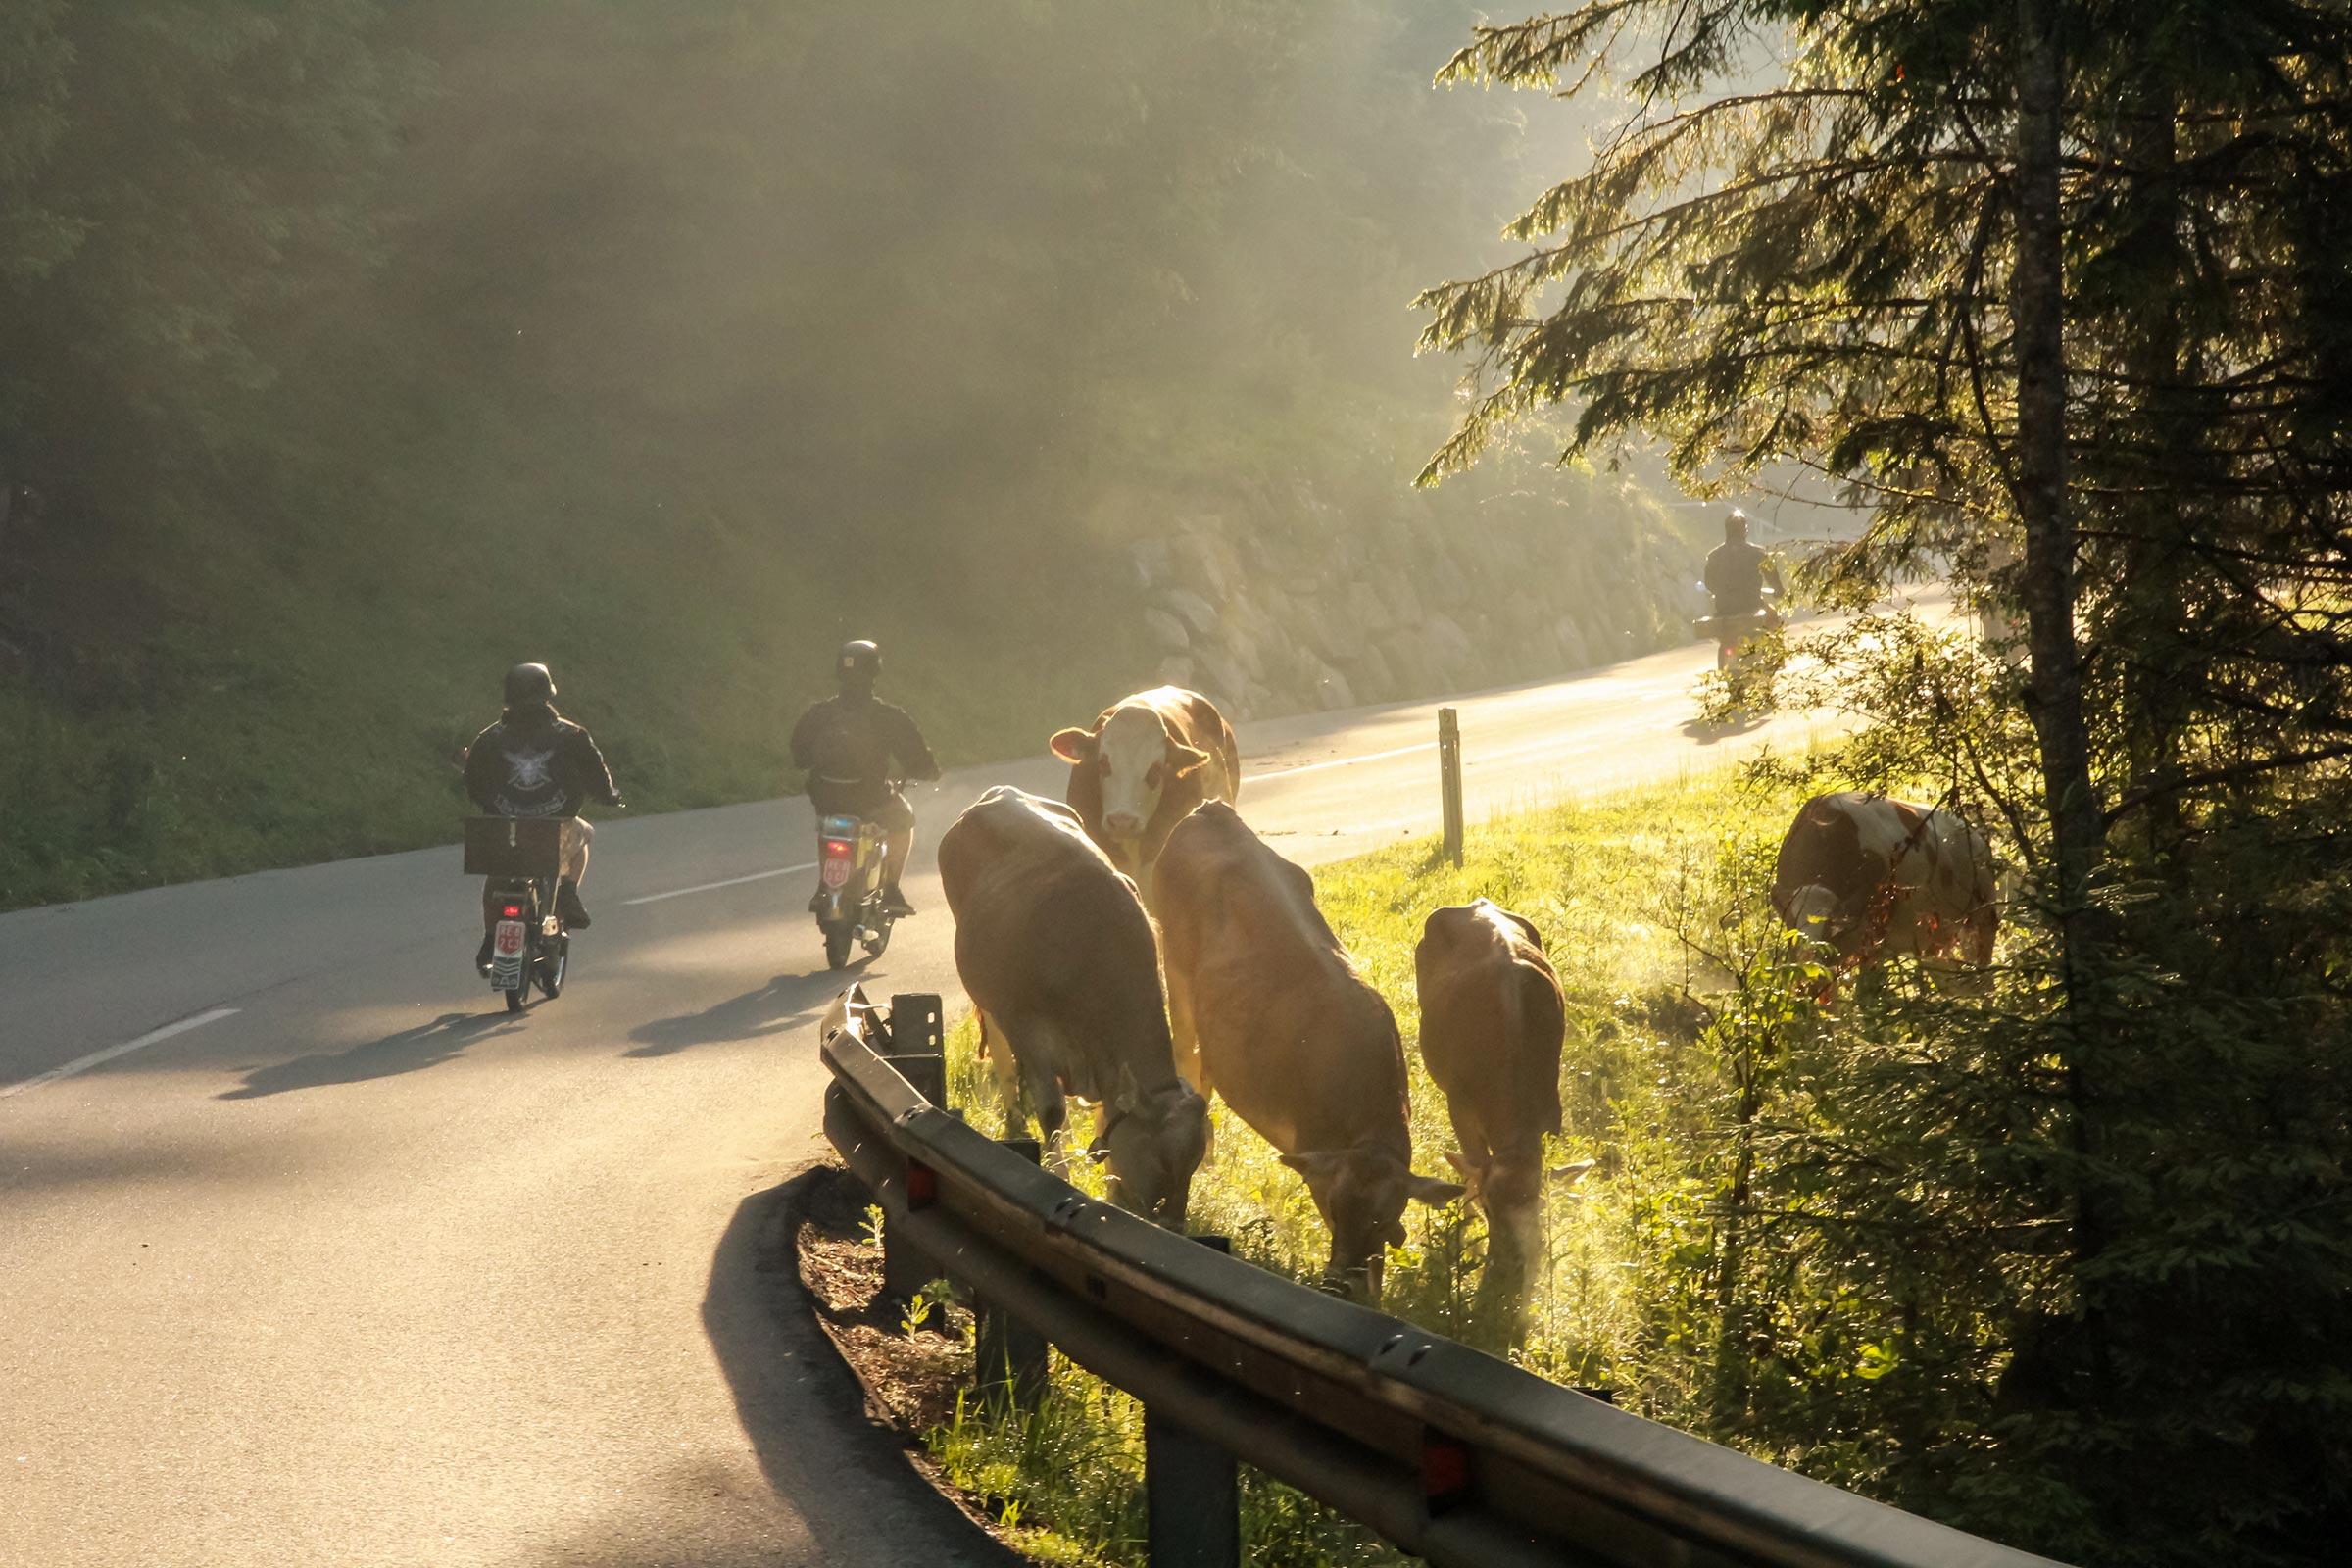 Ötztaler Mopedmarathon - Ötztaler Mountainbike Festival